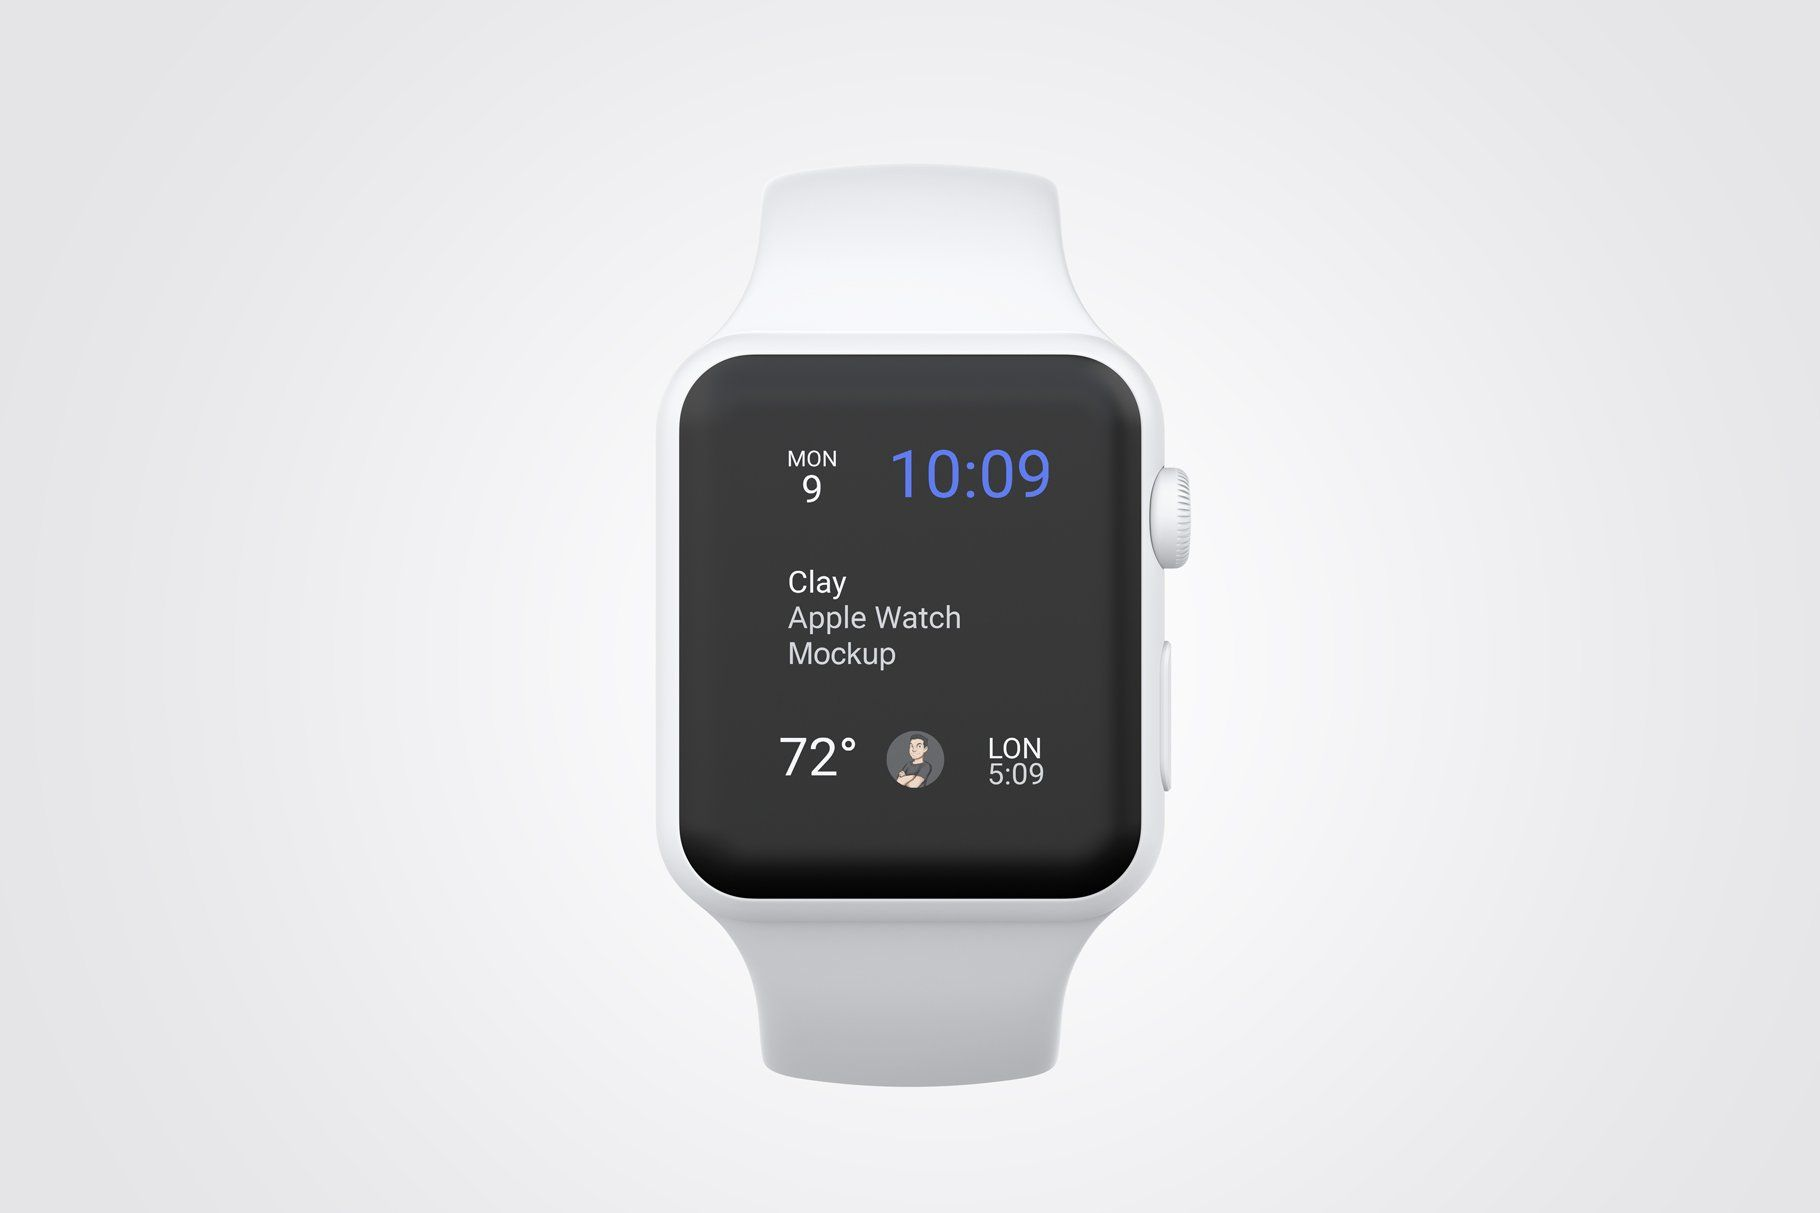 Clay Apple Watch Mockup 04 Business Card Design Minimalist Apple Watch Web App Design